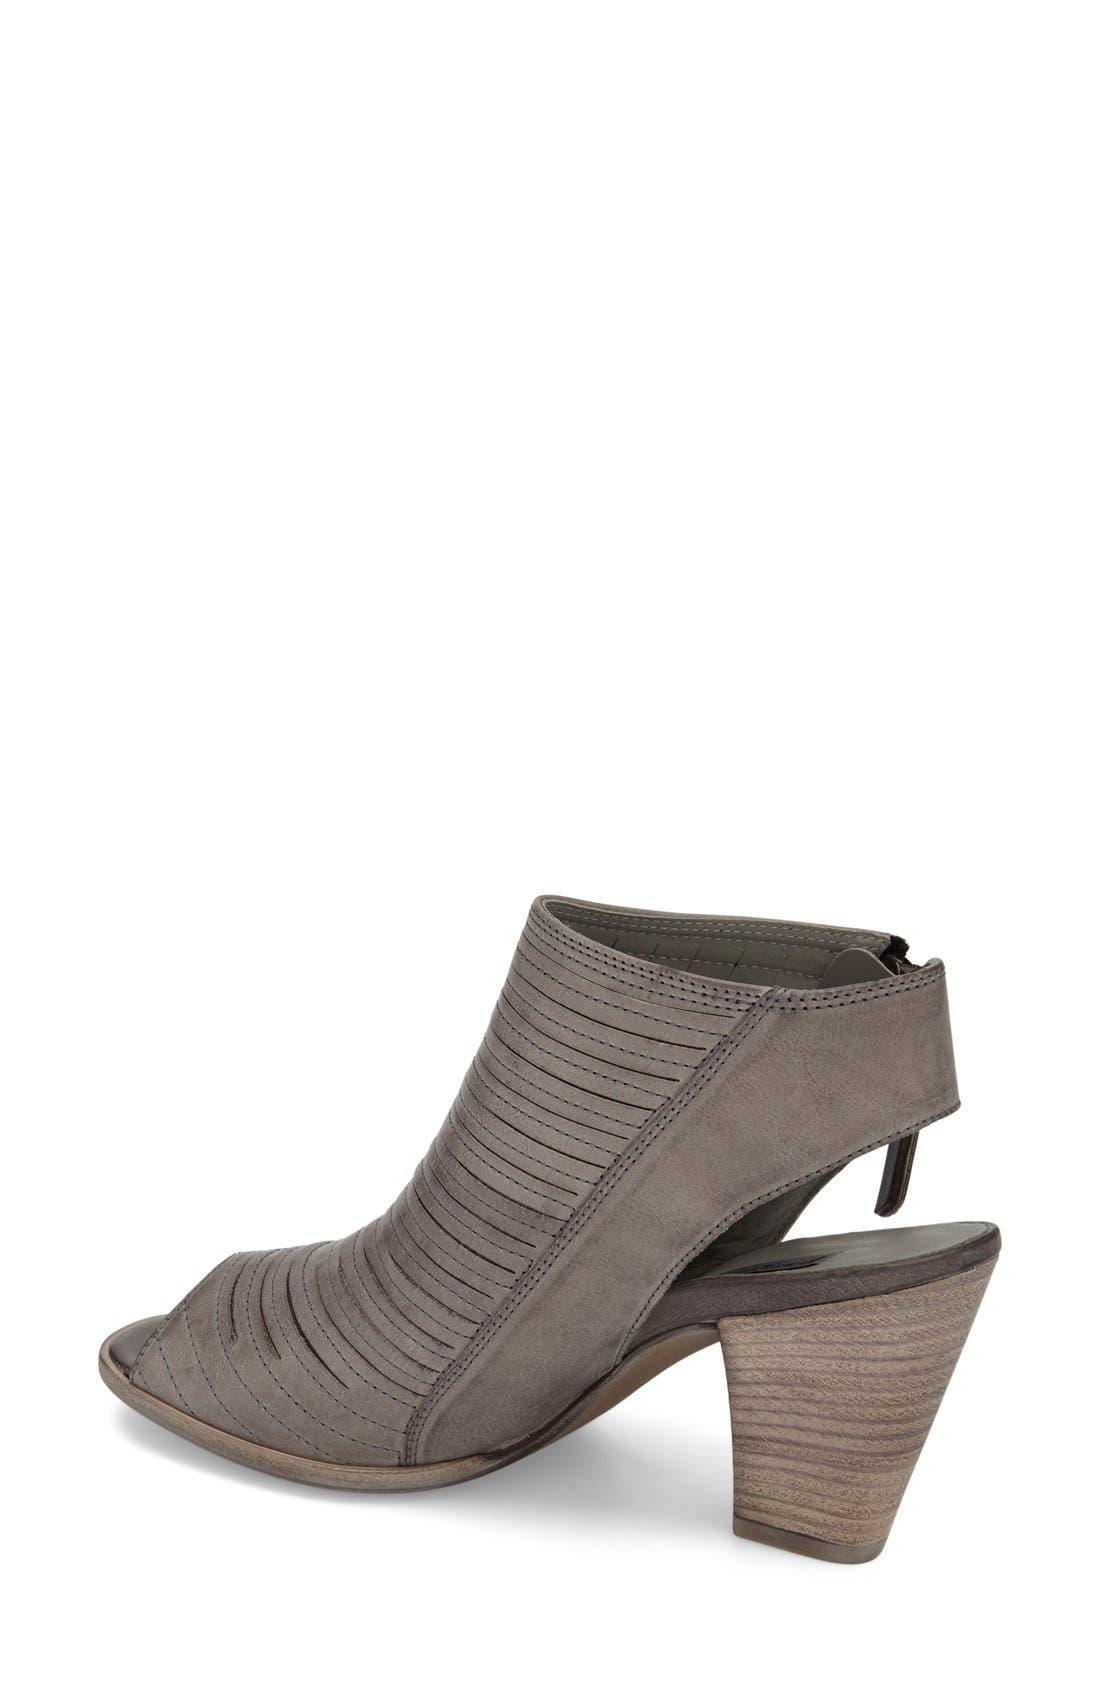 'Cayanne' Leather Peep Toe Sandal,                             Alternate thumbnail 16, color,